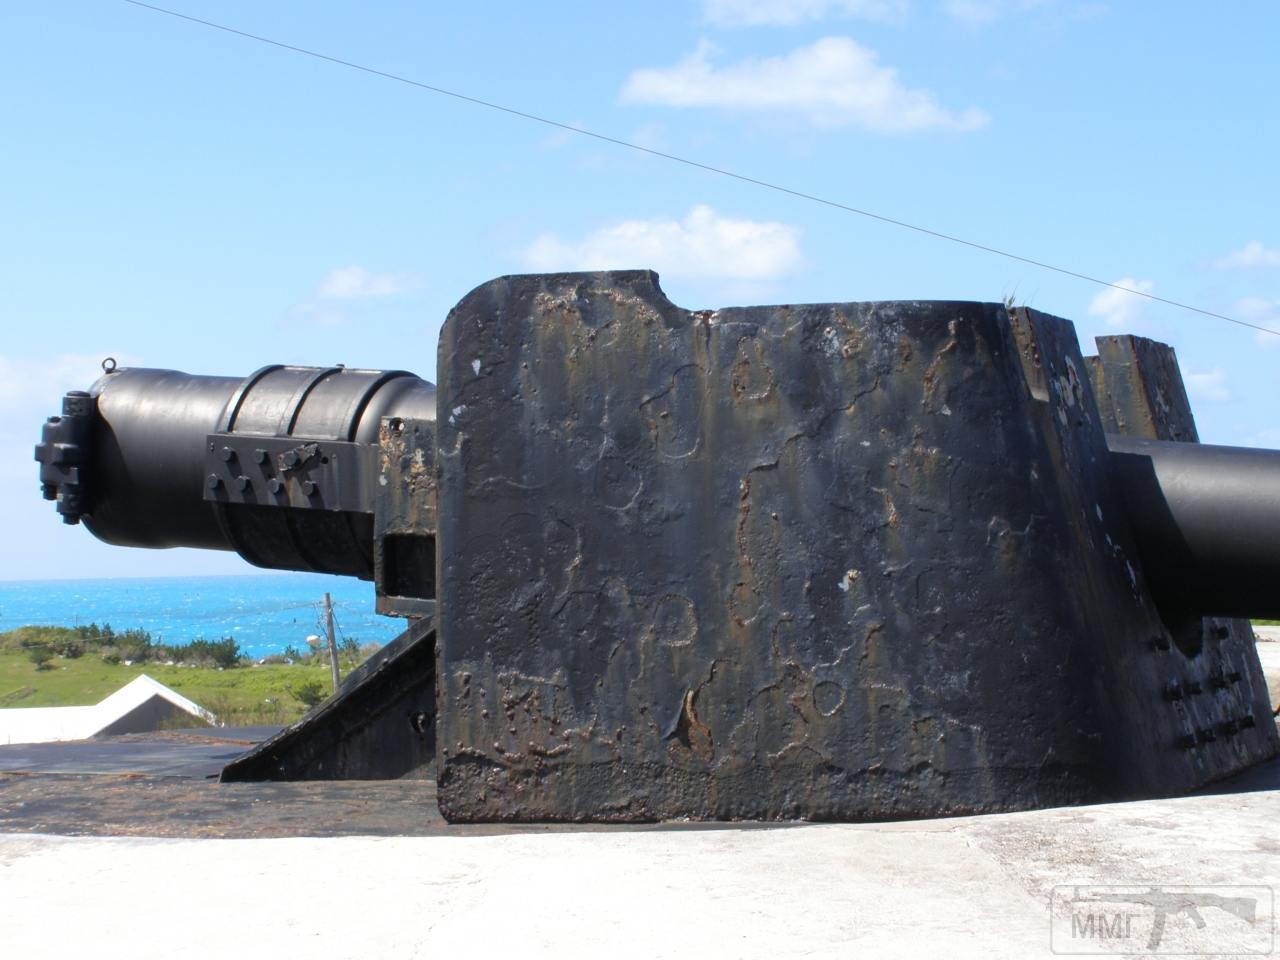 35012 - BL 9.2-inch Mk X